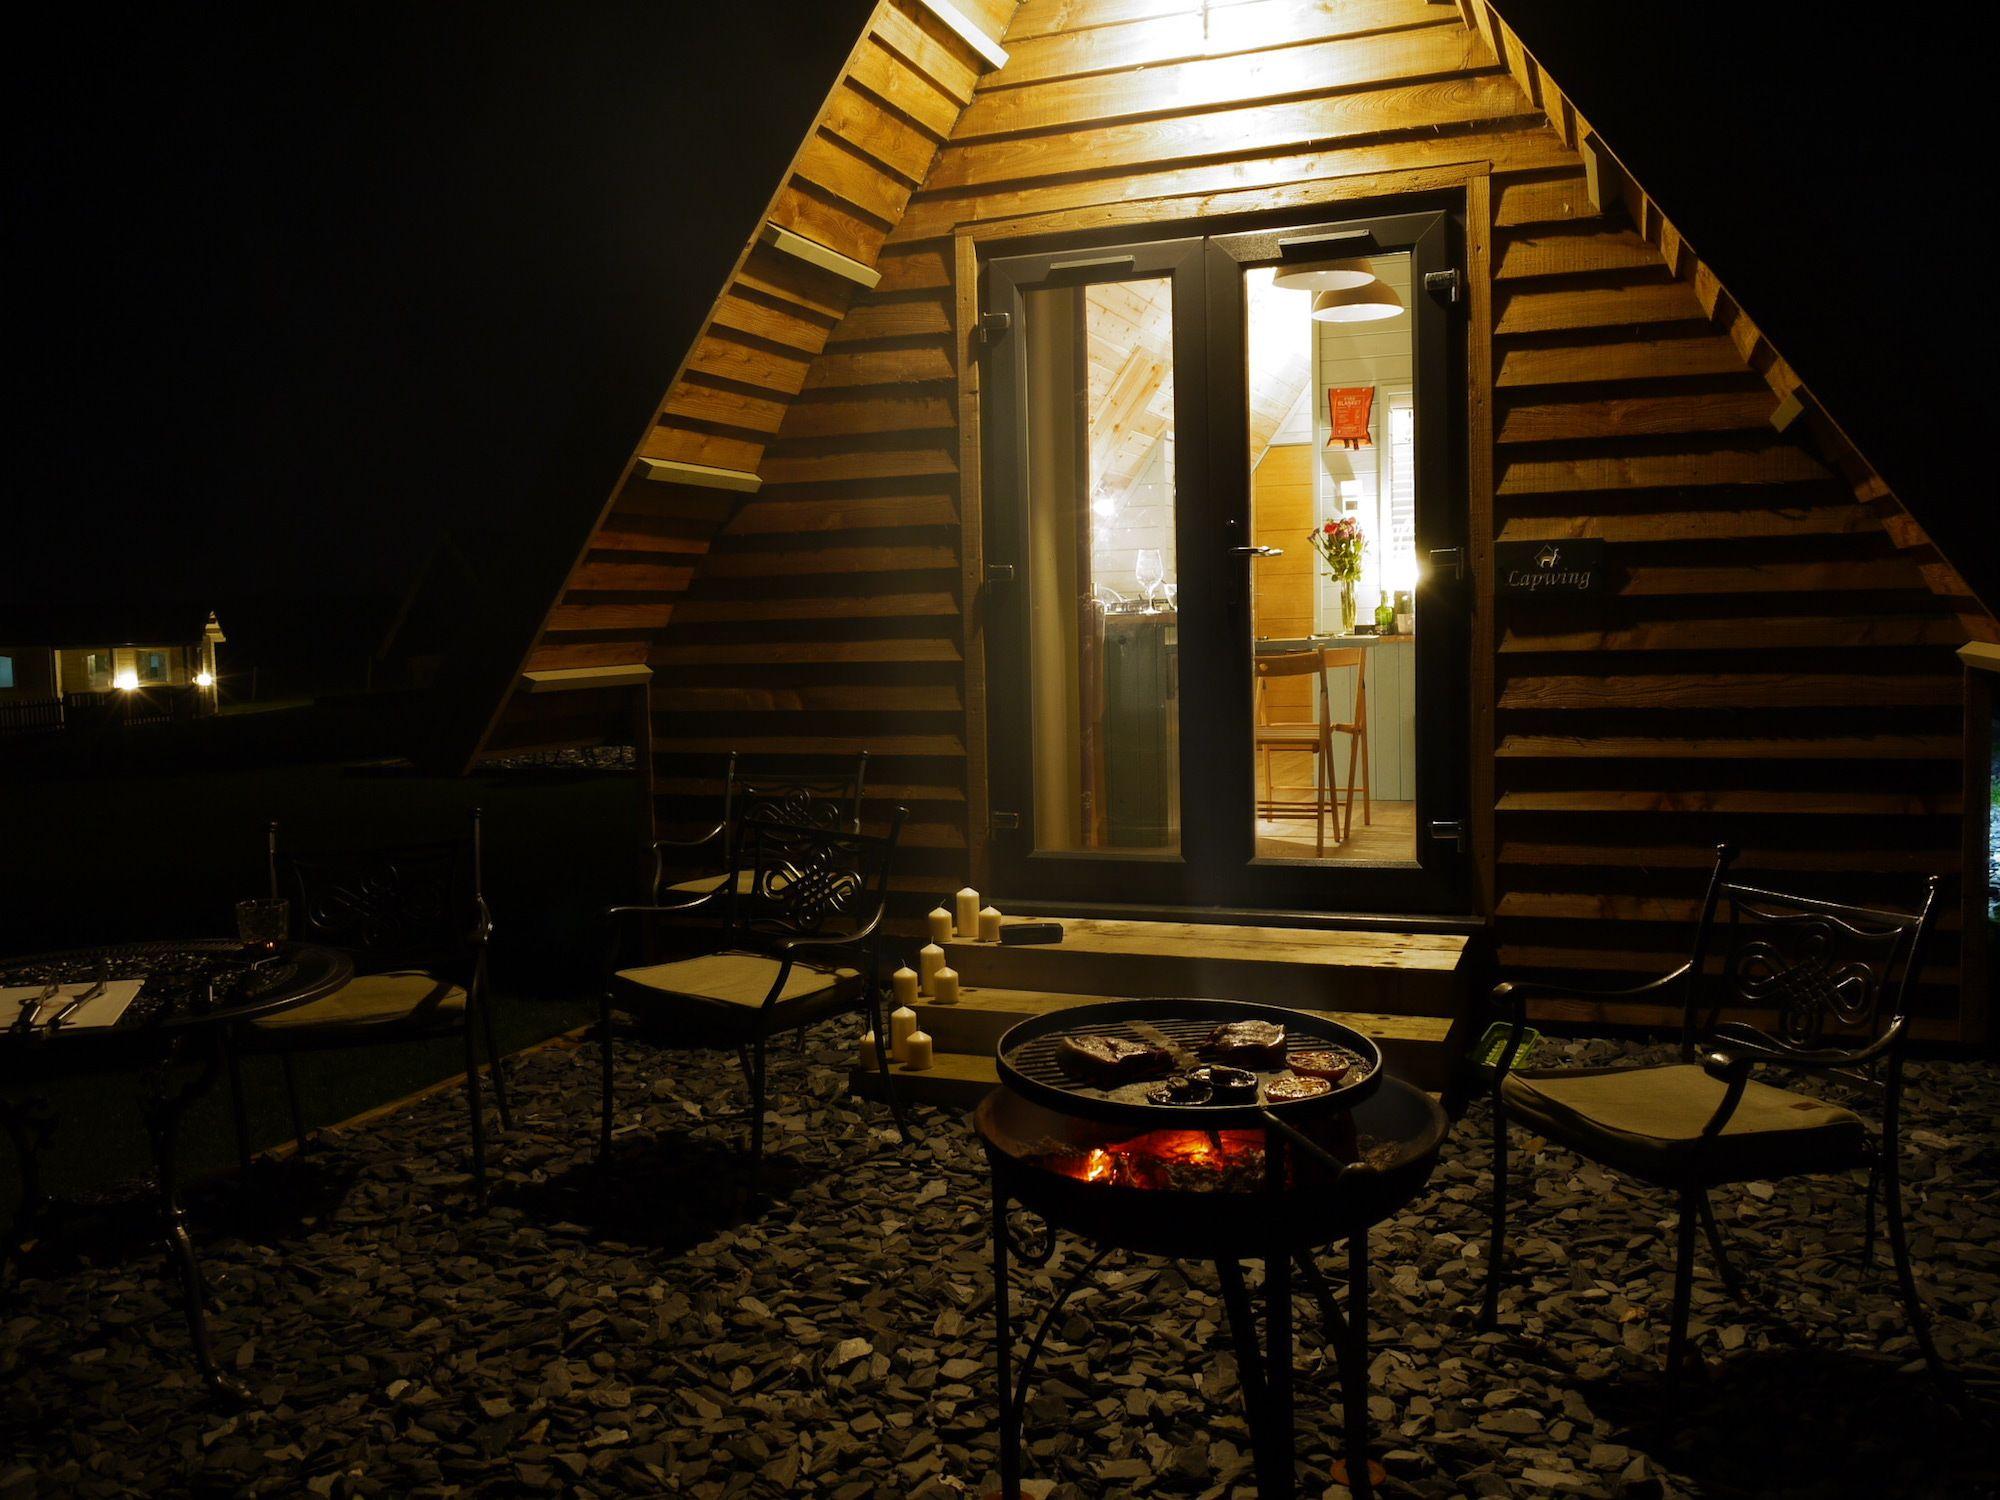 Midshires Glamping Lodge at Night